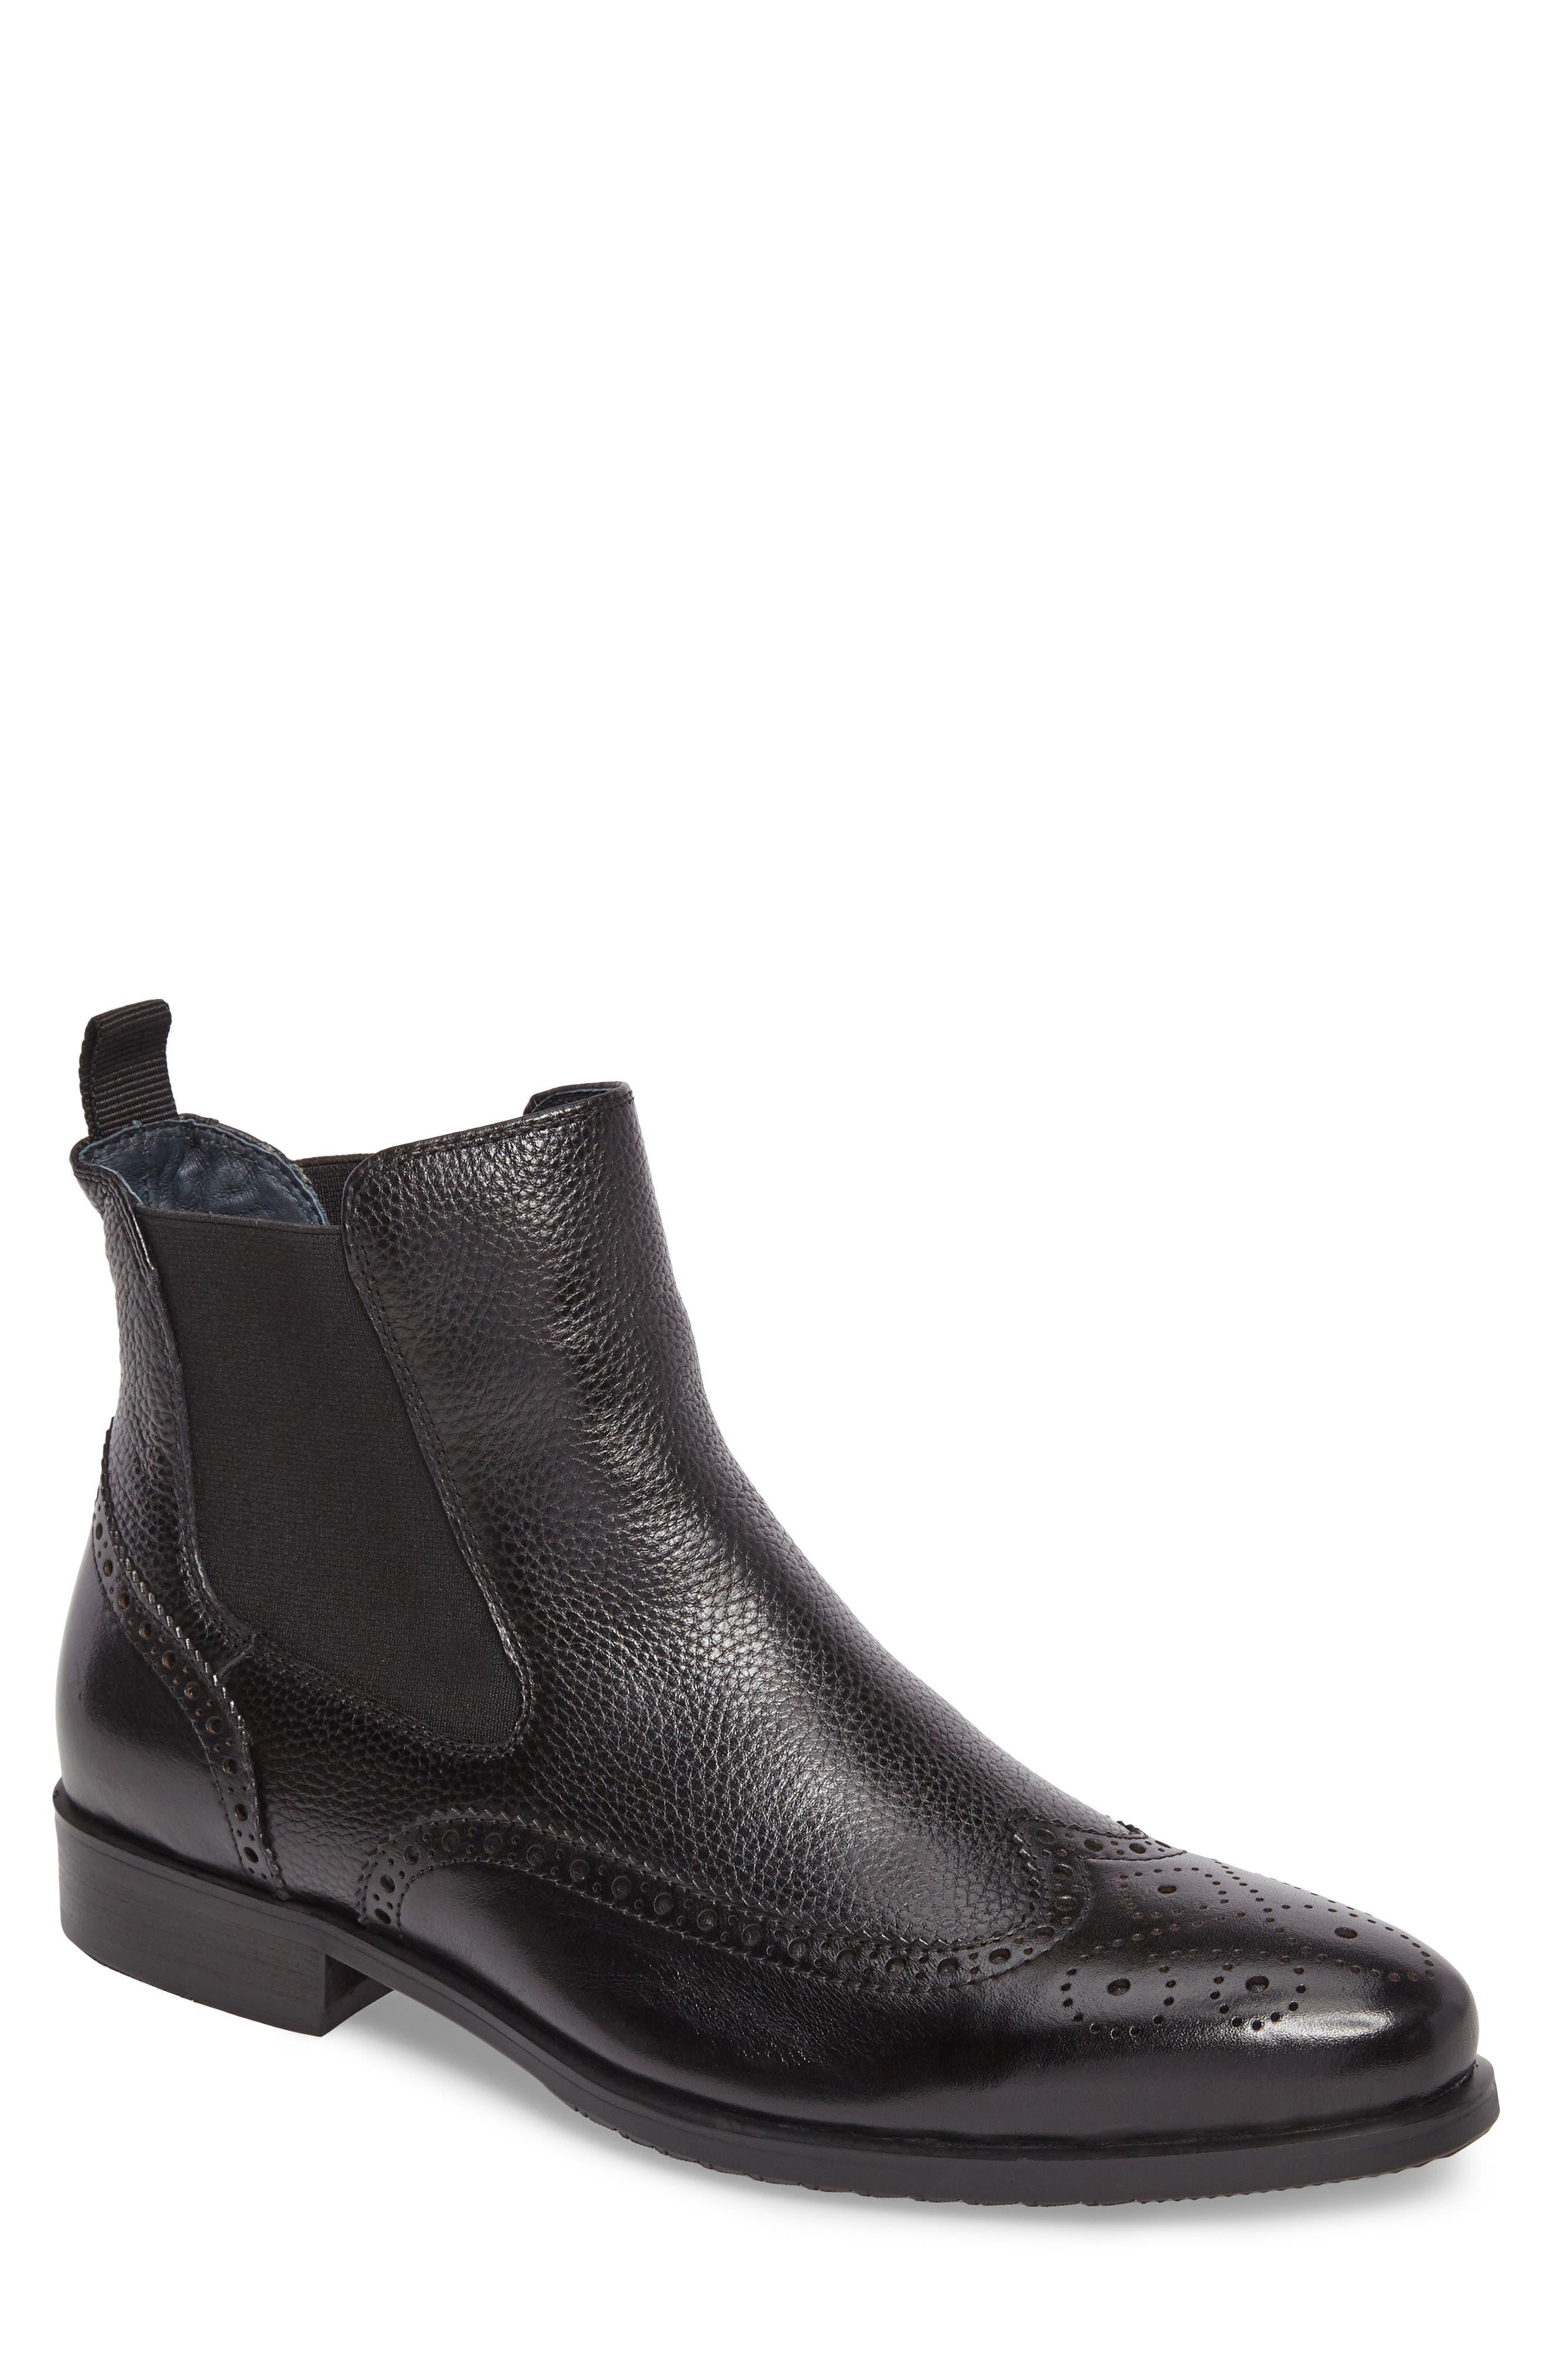 Hamel Chelsea Boot,                         Main,                         color, Black Leather